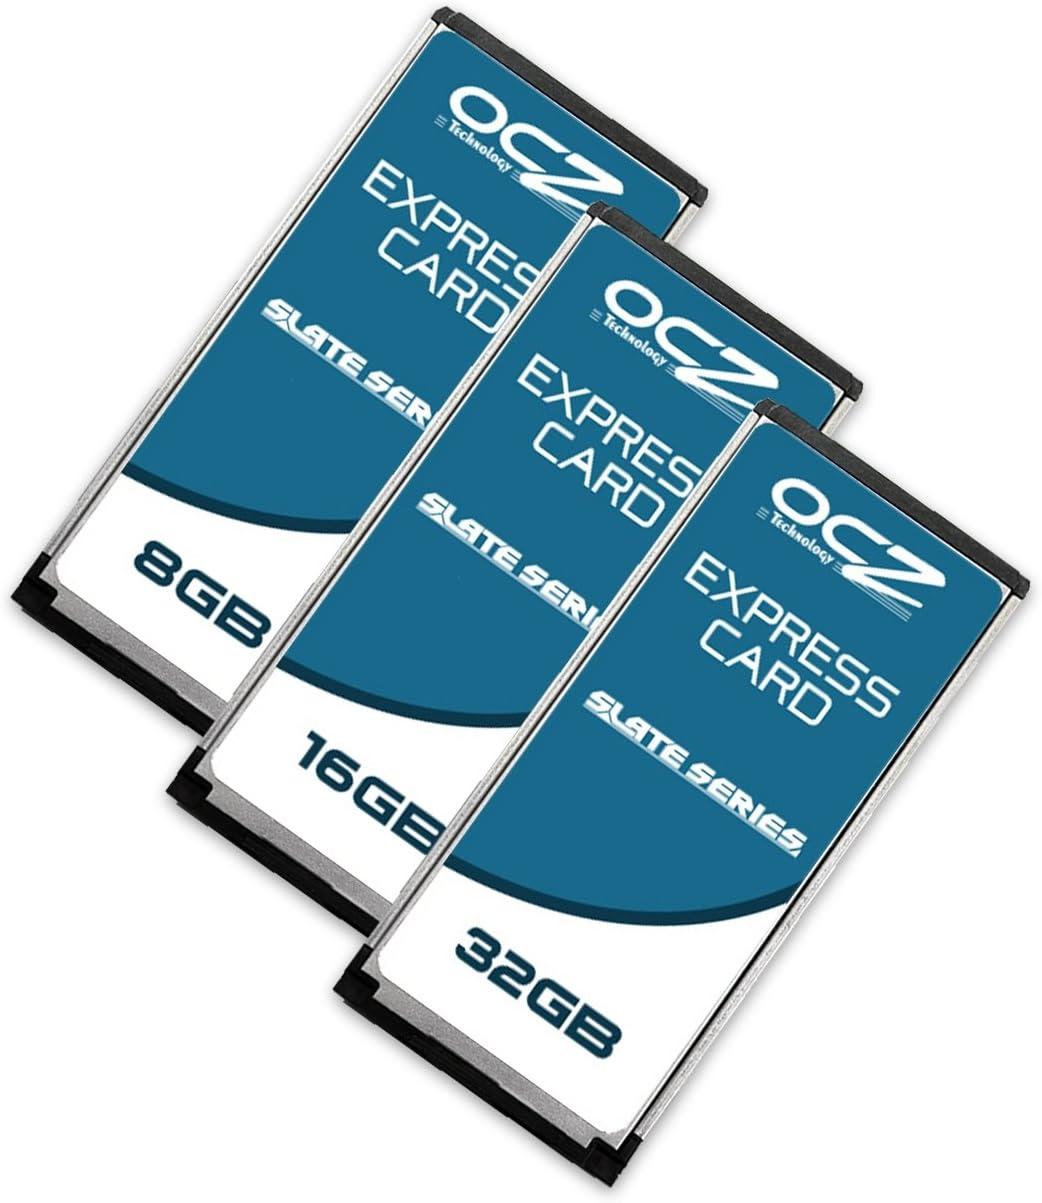 Ocz Slate Series Ssd Express Karte 32gb Usb 2 0 Computer Zubehör